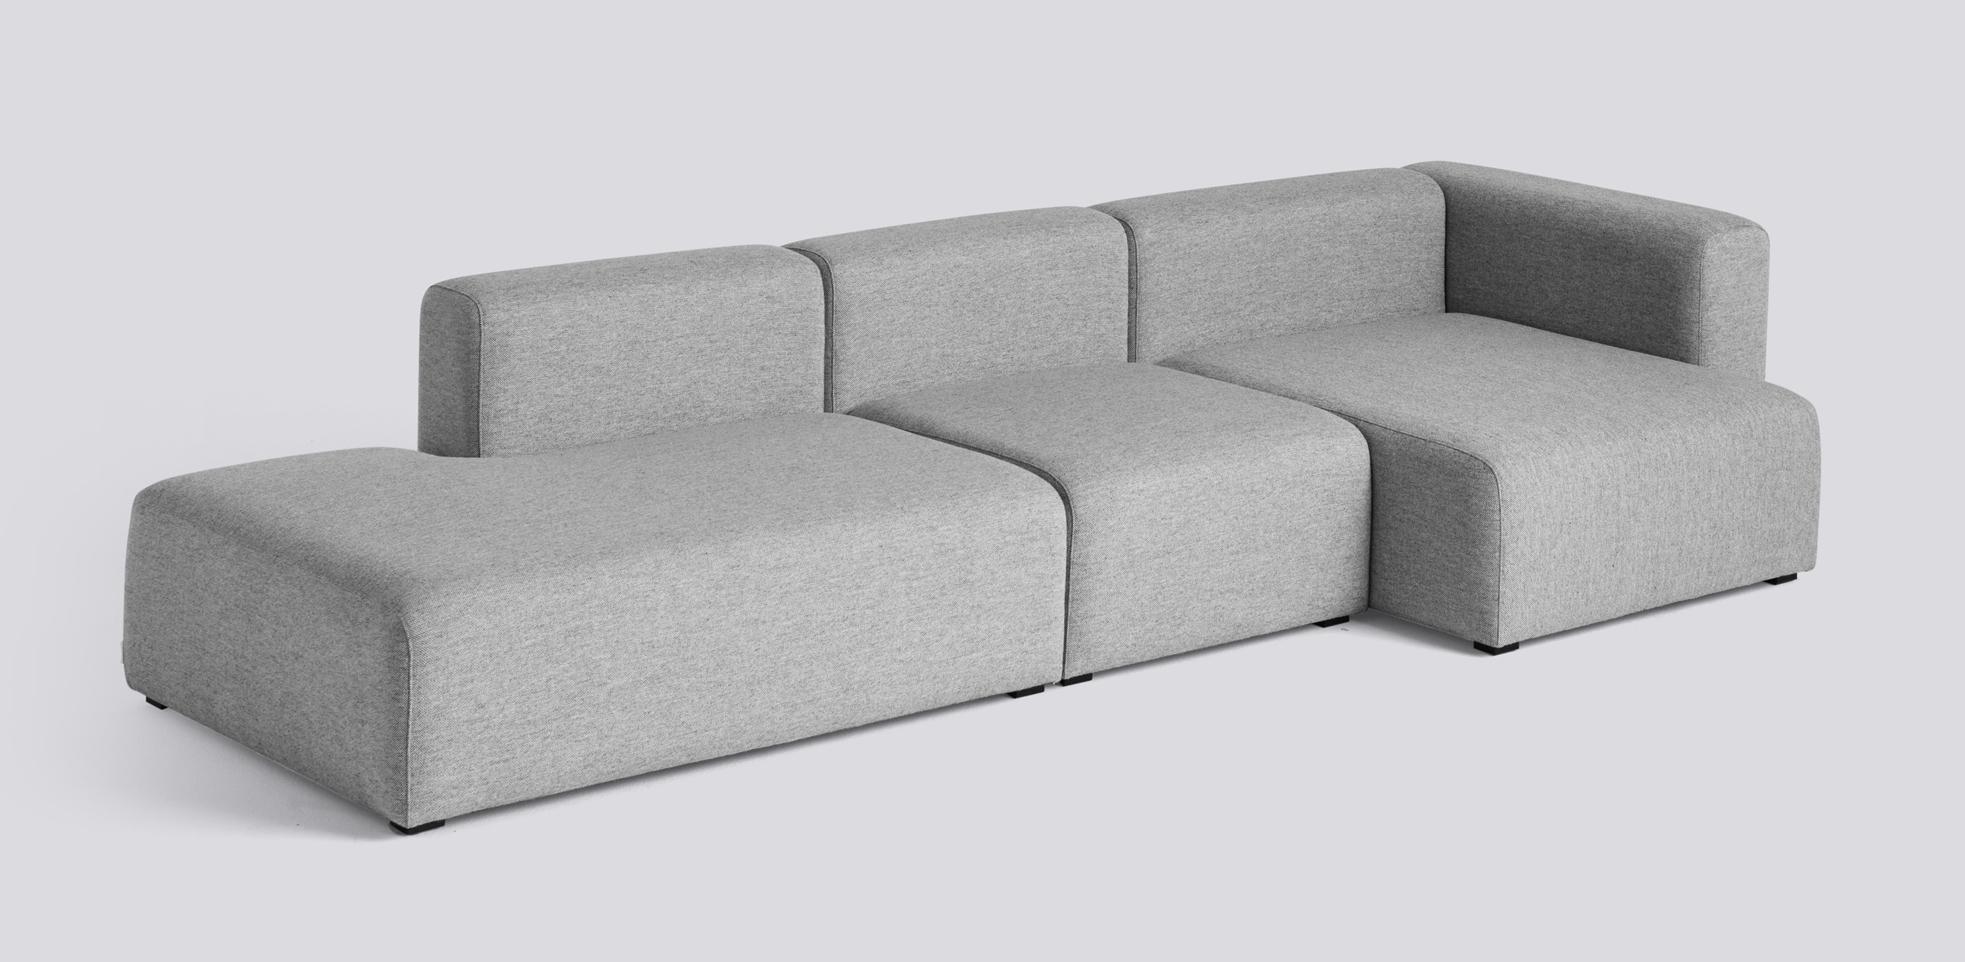 HAY Mags Sofa 3 Sitzer Komination 4 Right End | Hallingdal 116